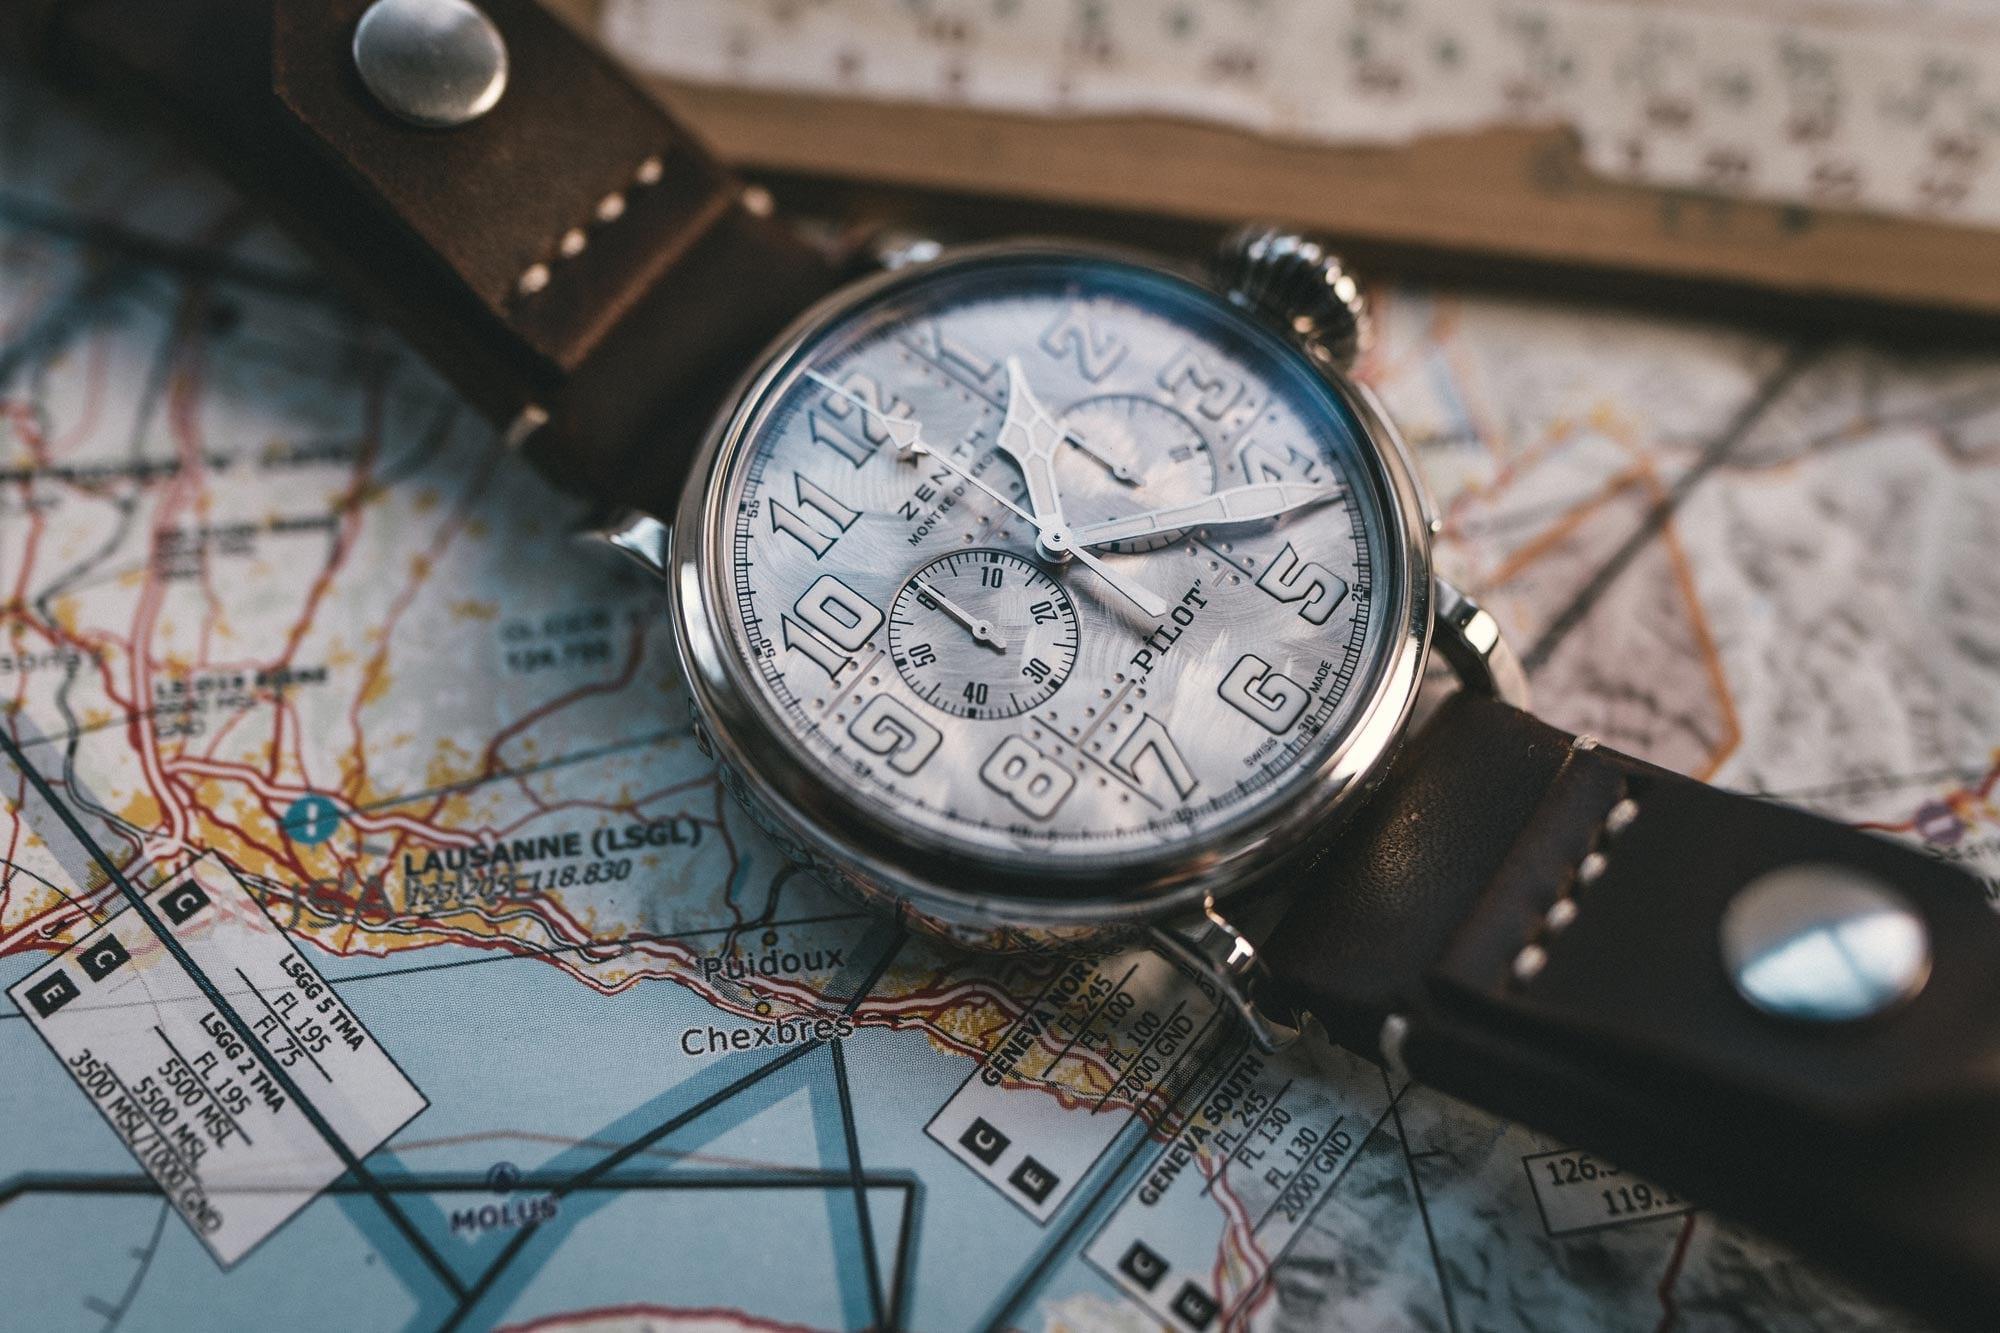 Zenith Pilot Type 20 Chronograph Silver * Watches World : Watches World